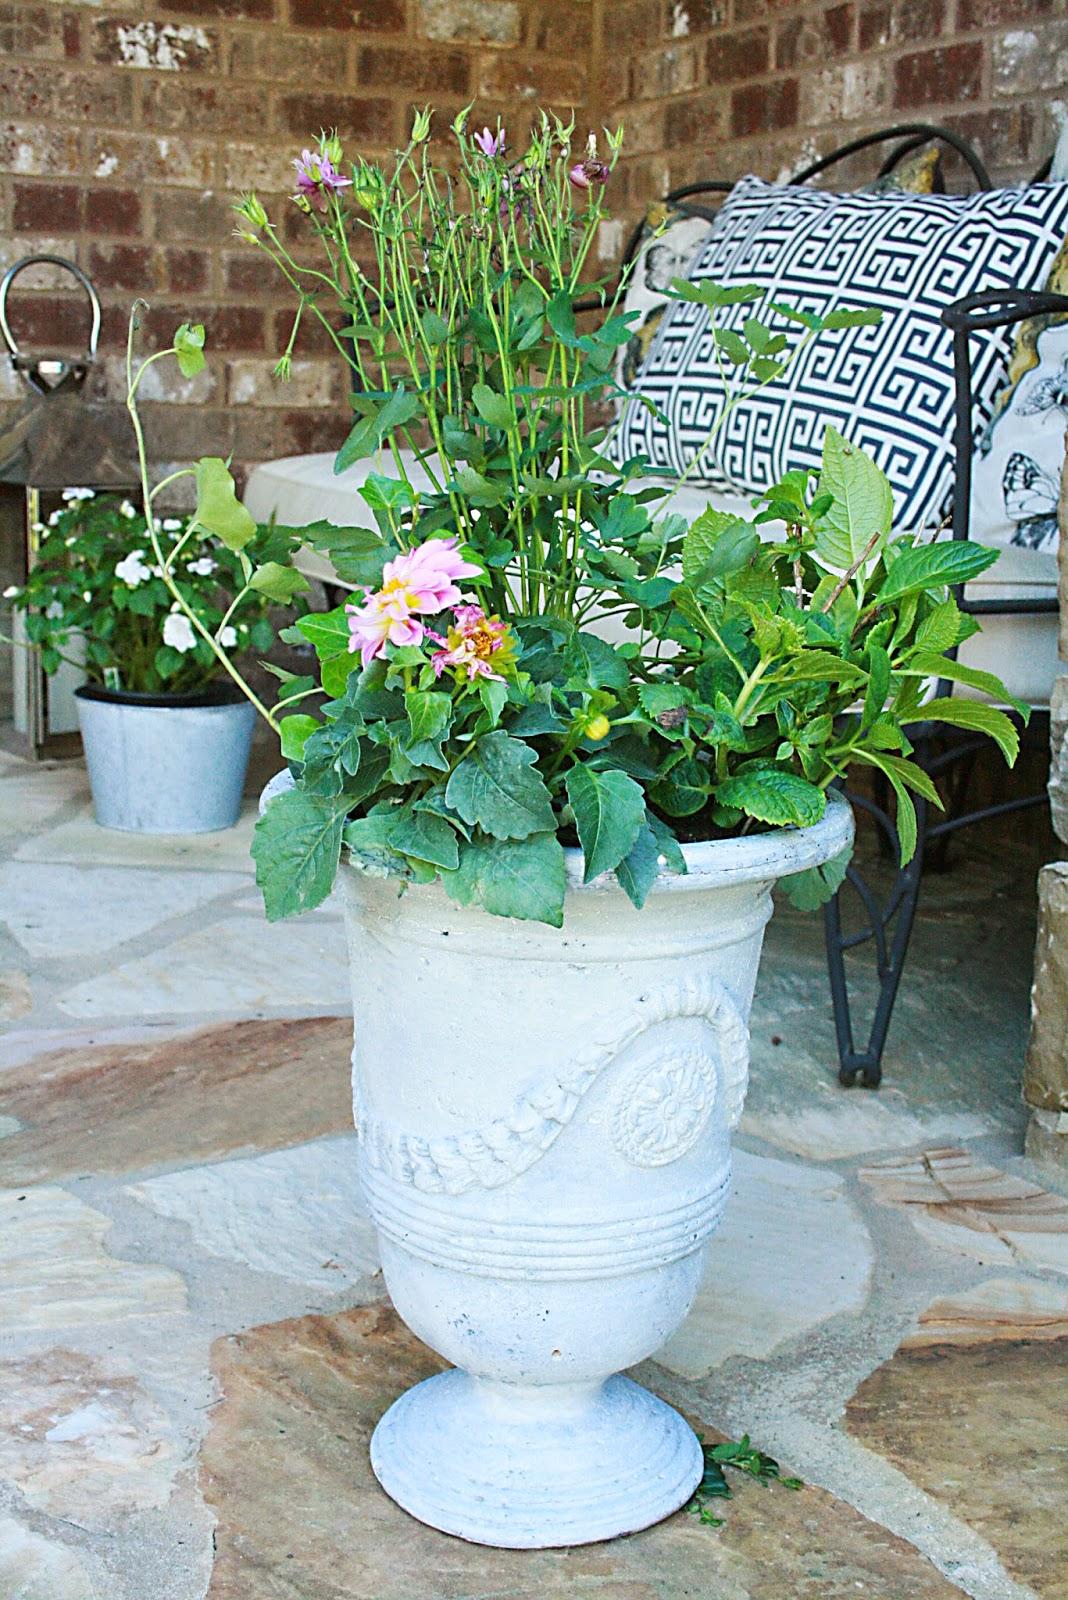 gardening, planting, pots, flowers